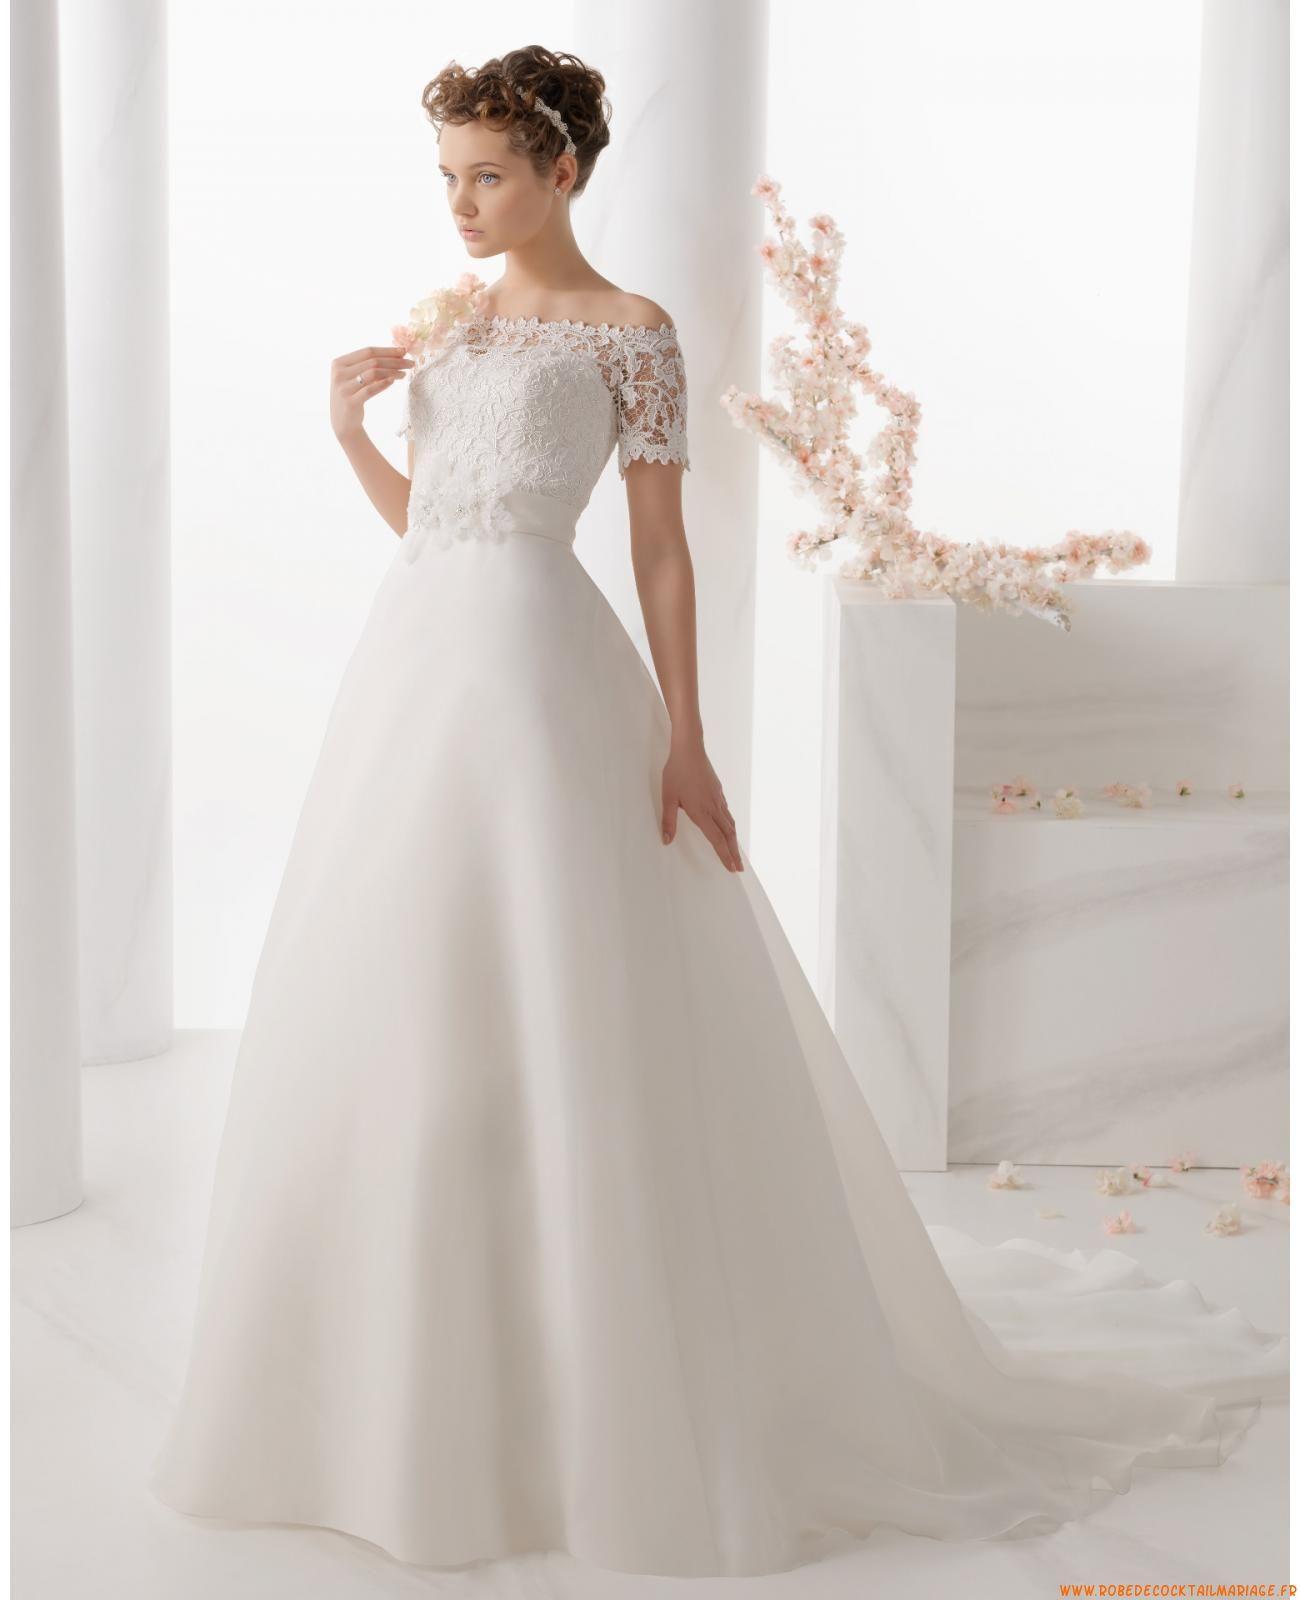 Robe de mariée princesse organza manches dentelle col bateau | robe ...